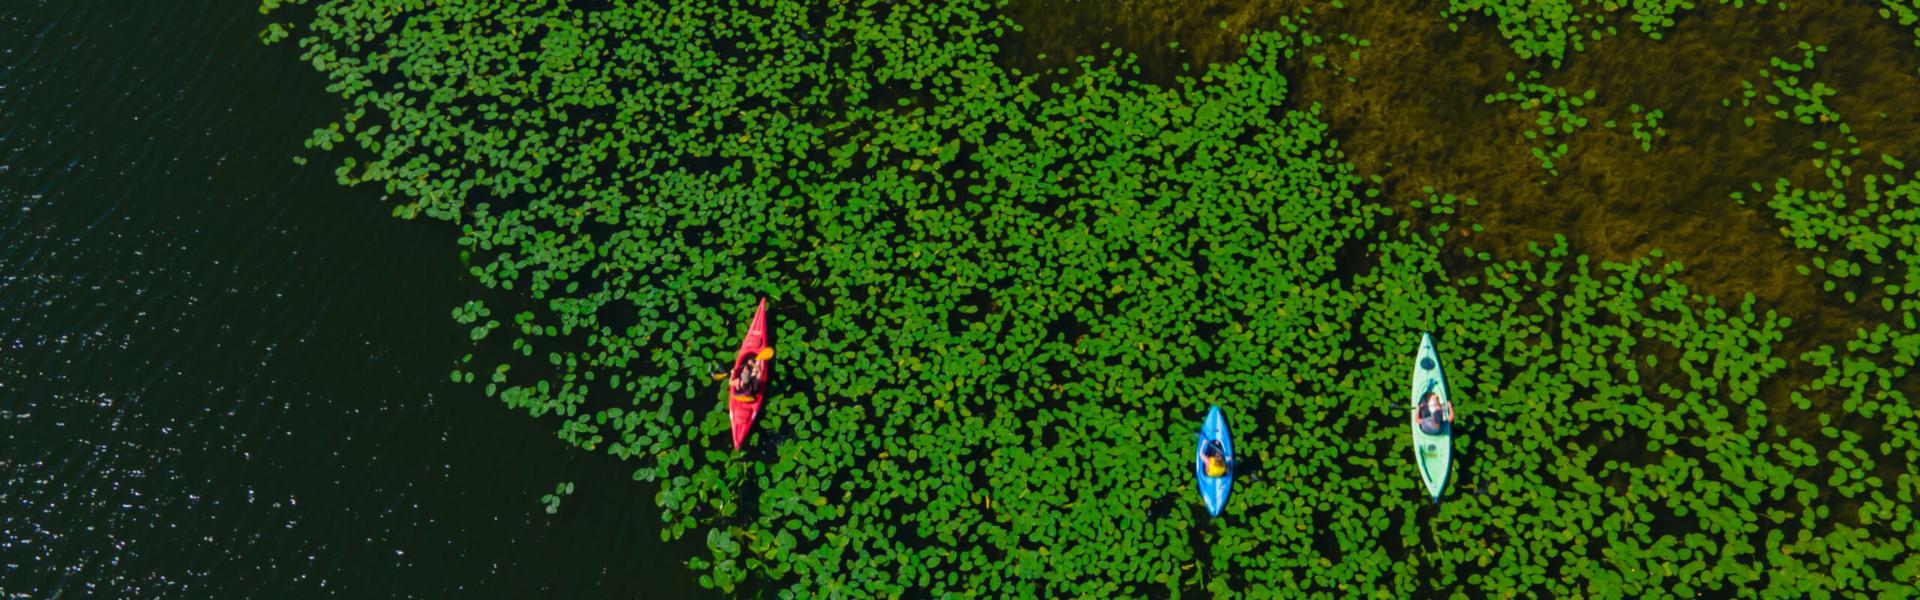 Porcupine Summer Photos Drone-47